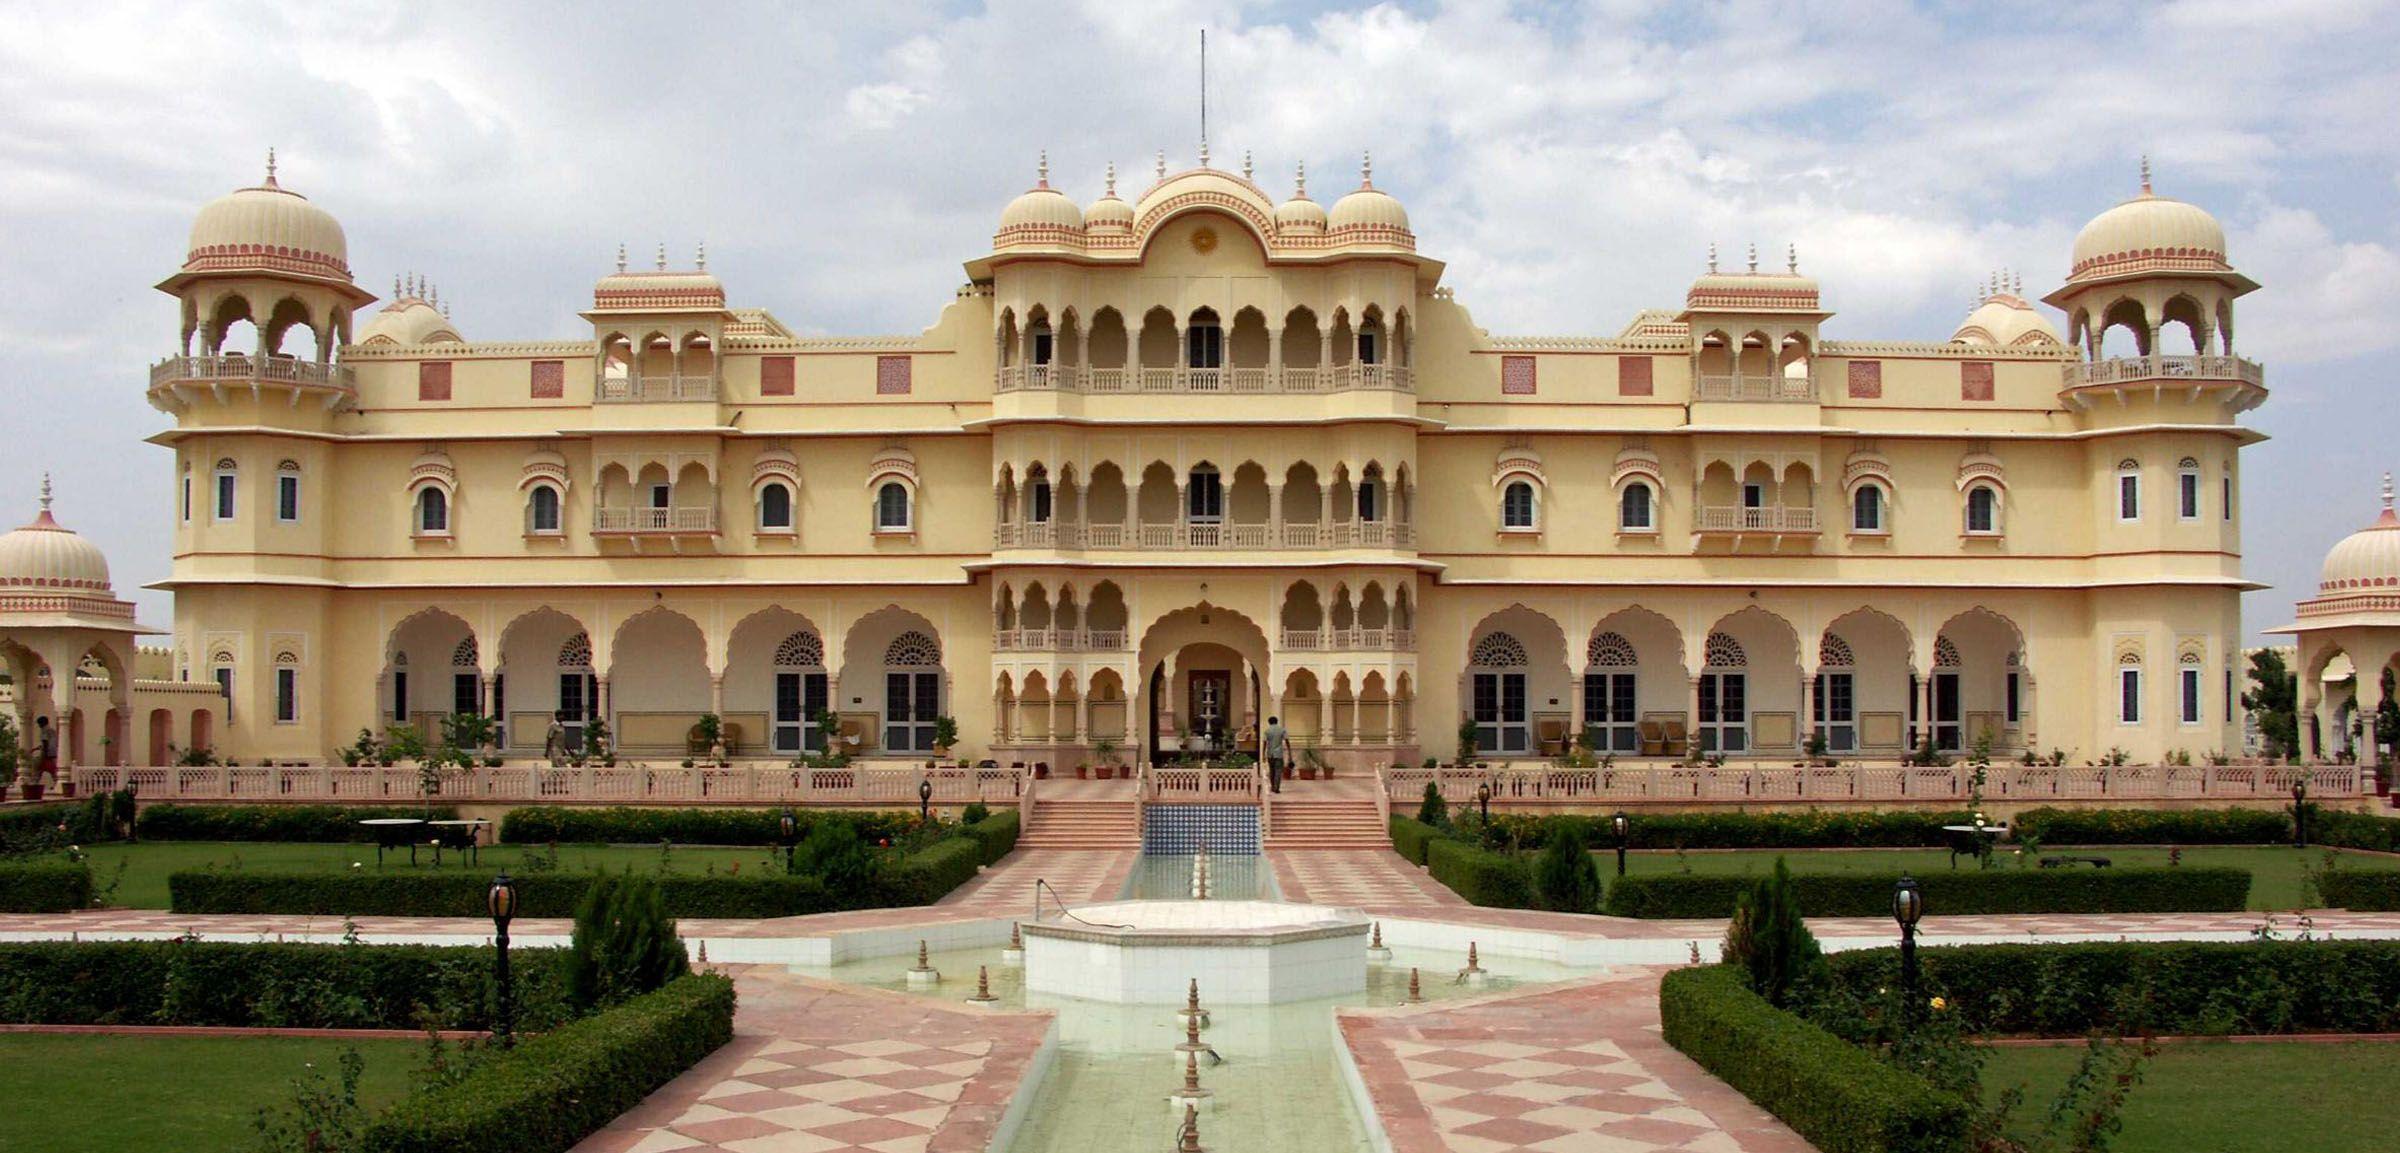 Chomu Palace, a reflection of the Royal Palaces of India